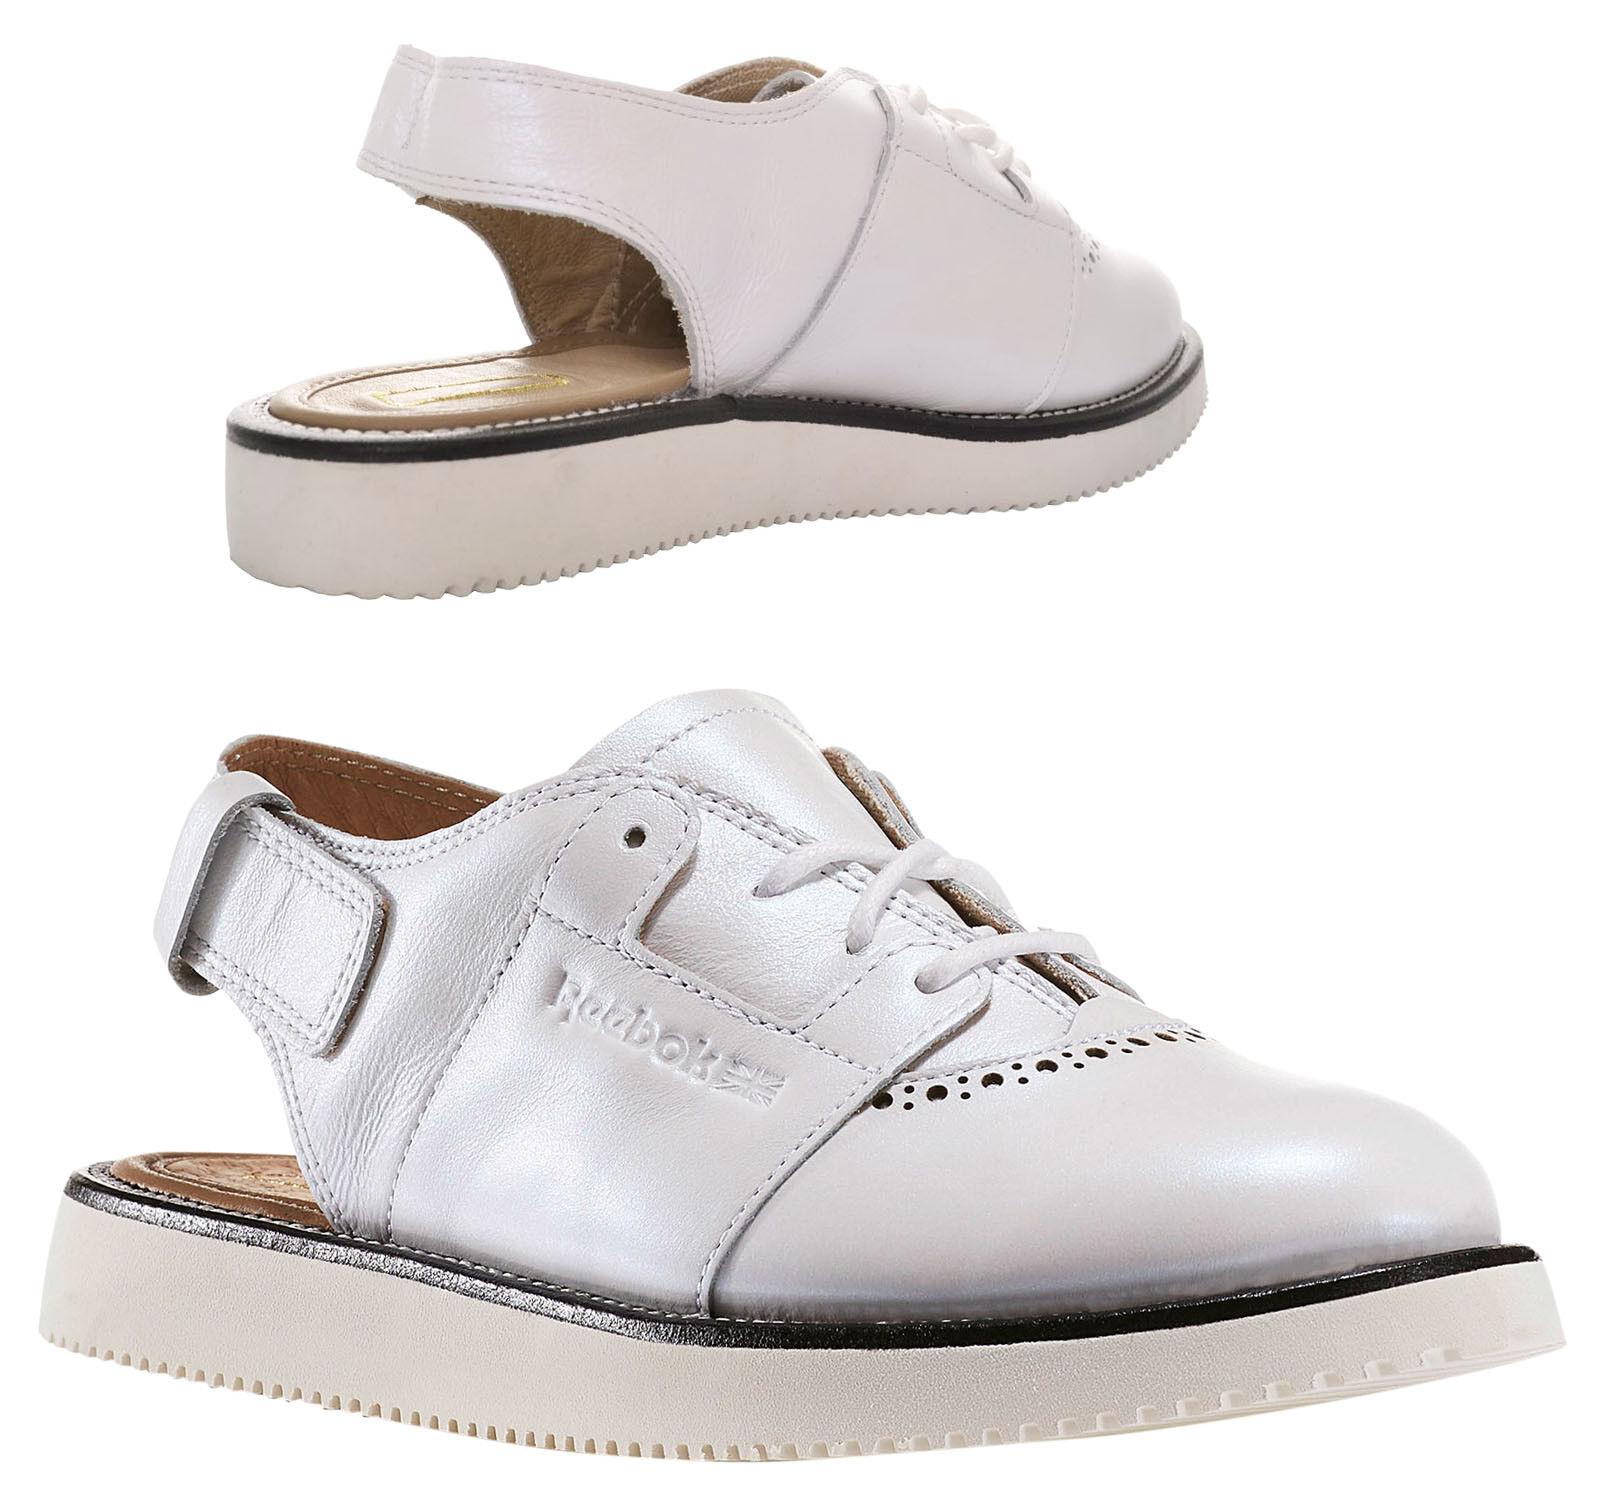 Reebok Reebok Reebok 58 Bright Street universal para mujer lo Vibram Sandalia Zapatos blancoo BD3201 M7  distribución global